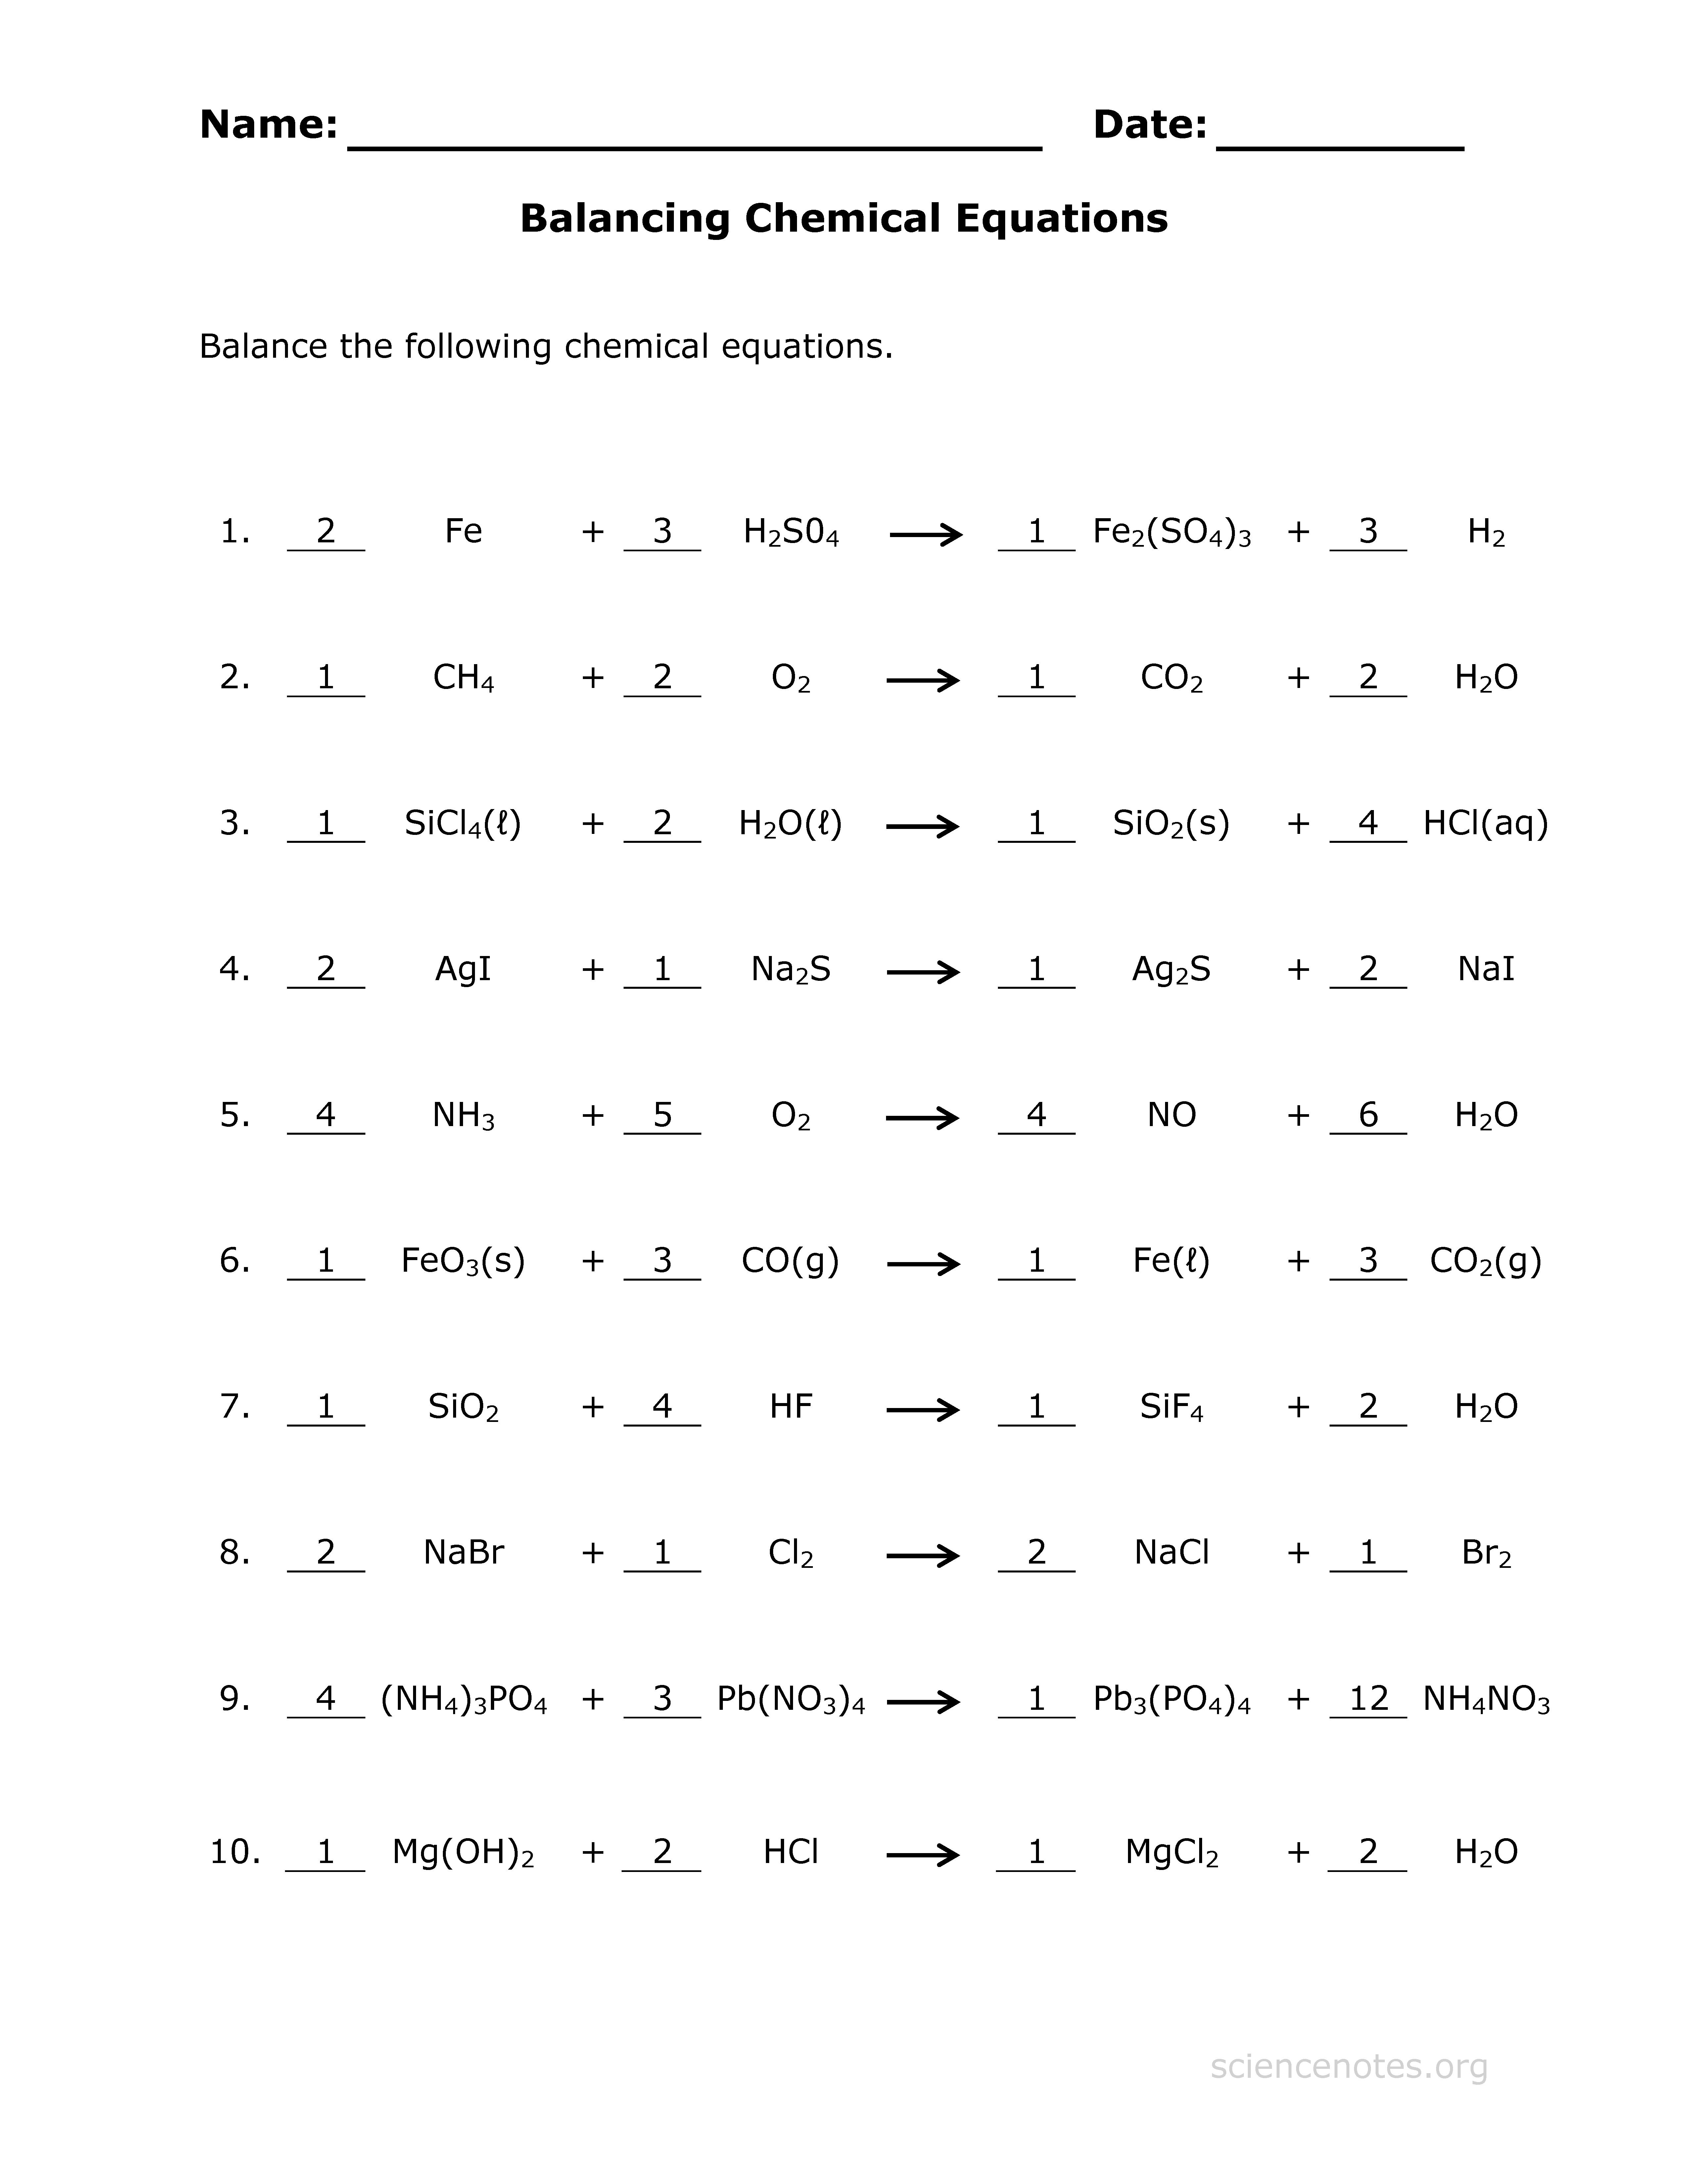 Balancing Equations Worksheet Answer Key The Best Worksheets Image